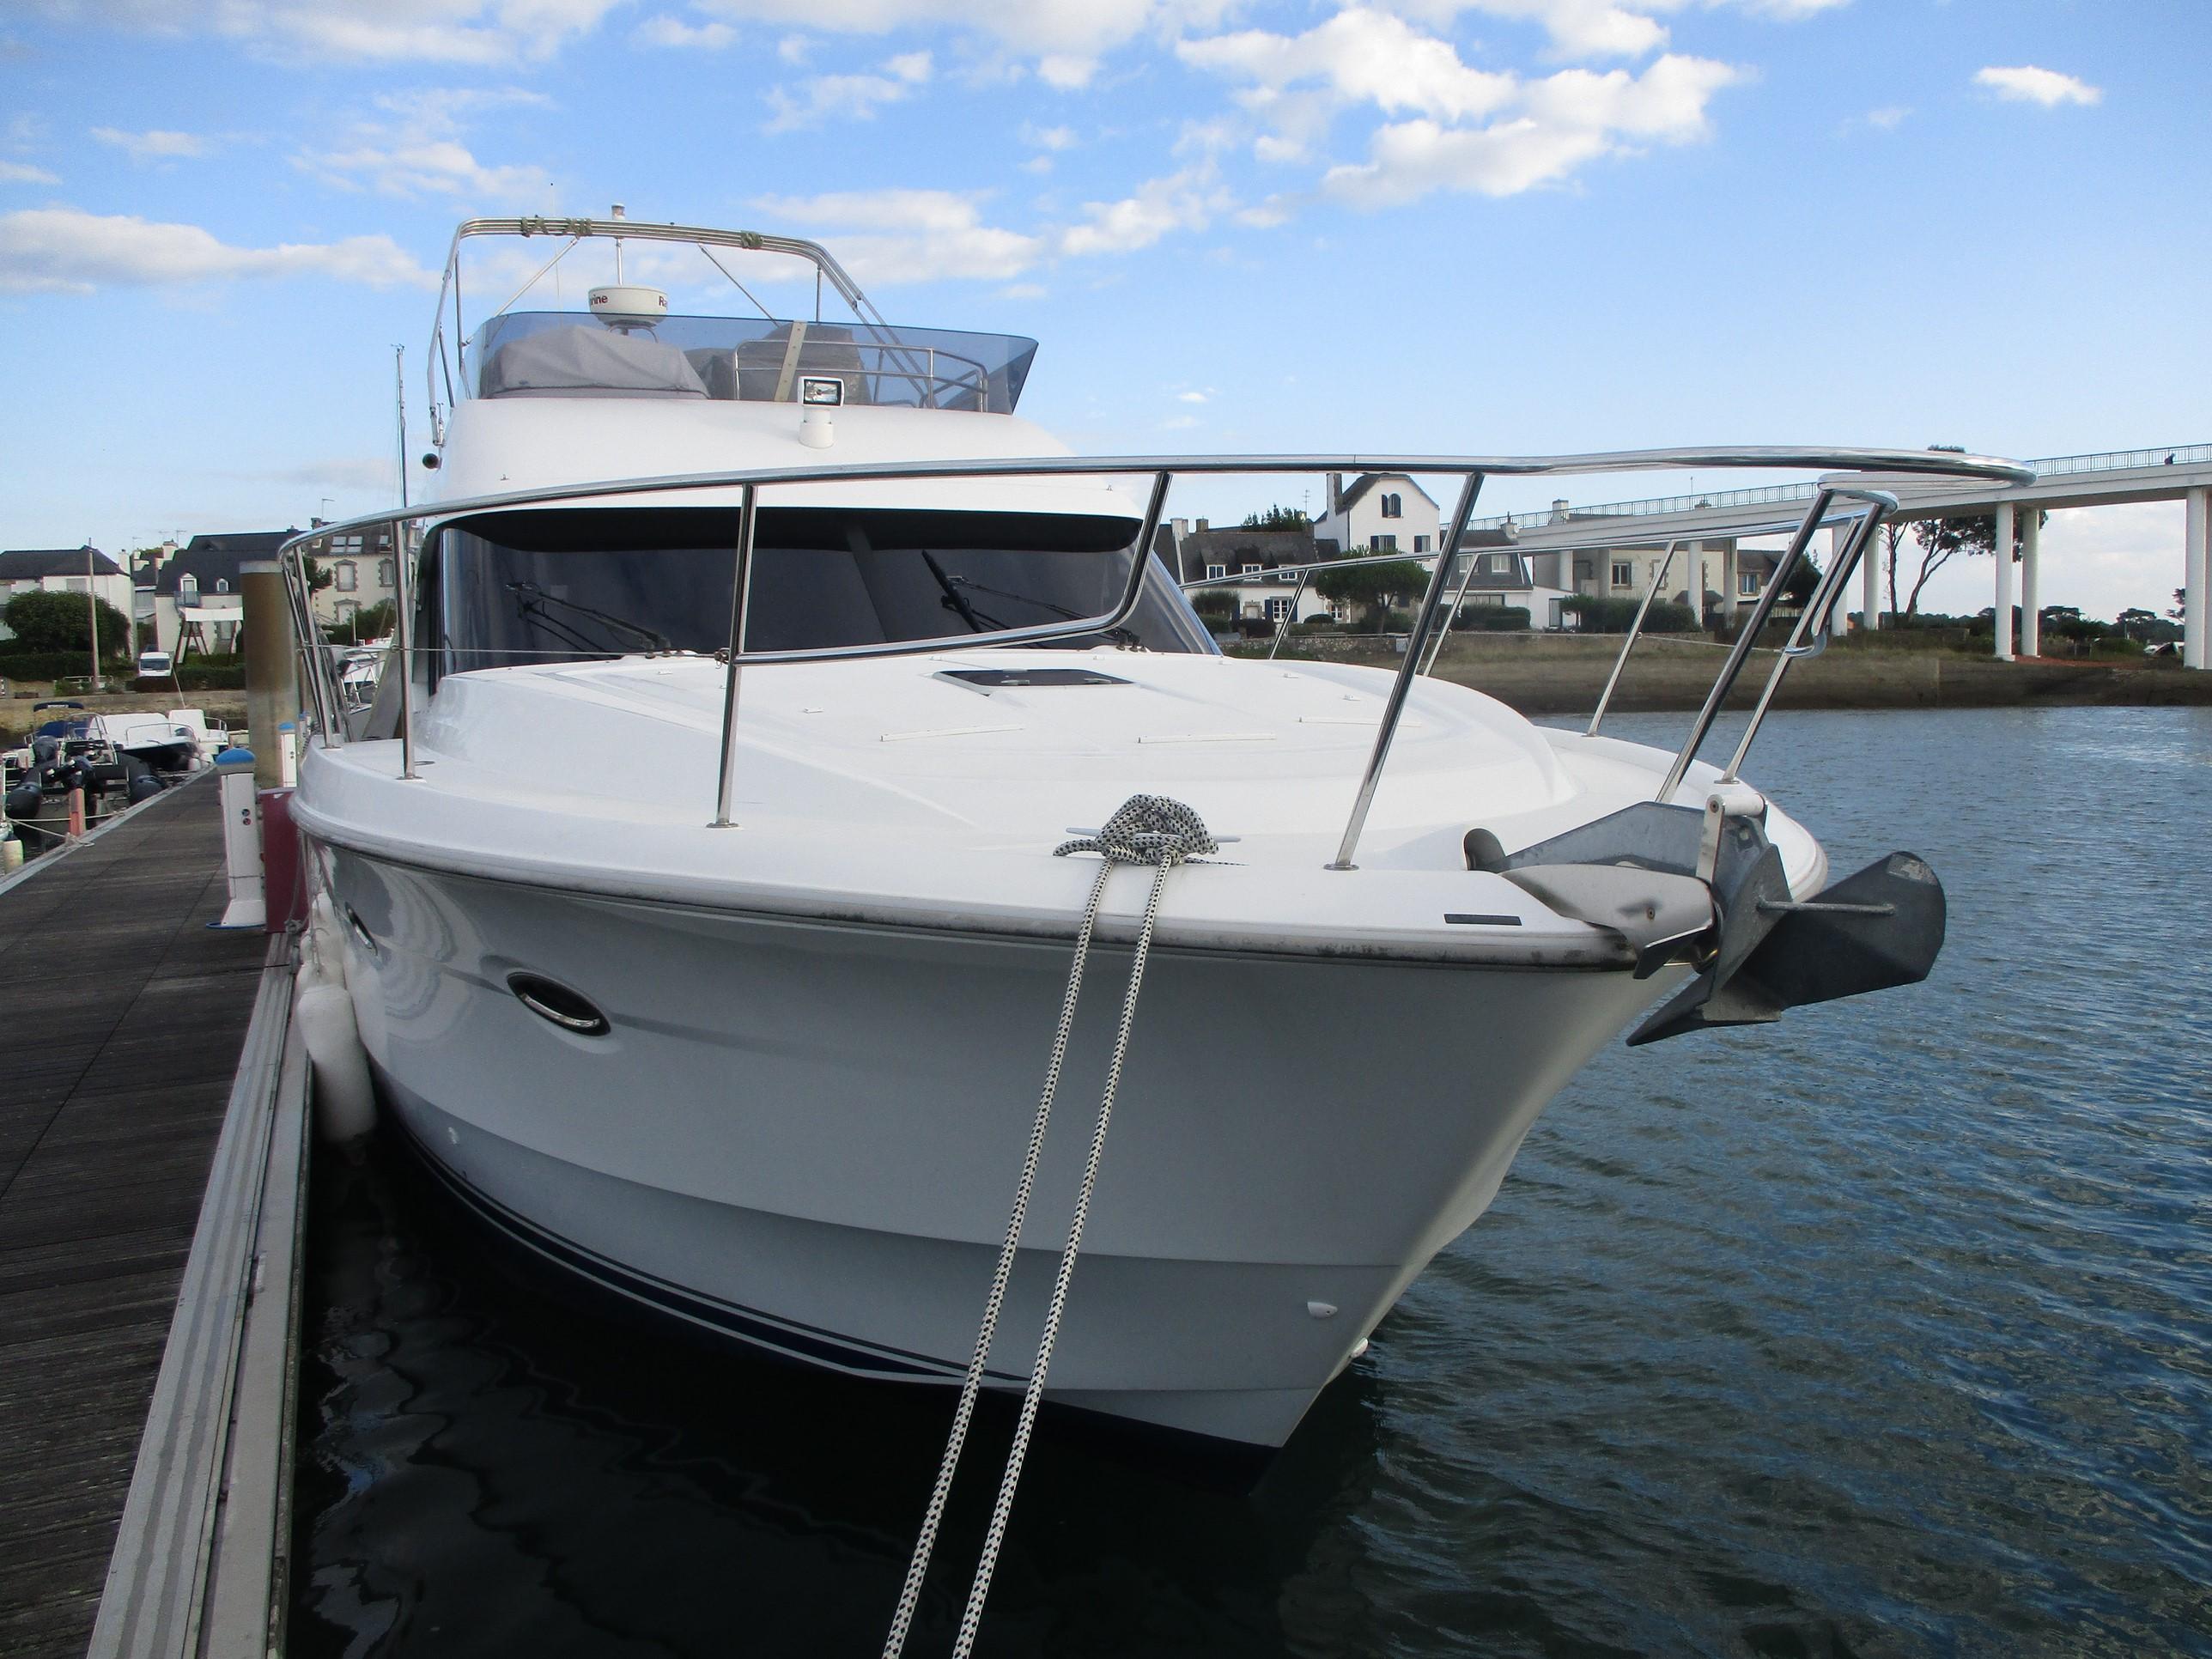 location de bateau moteur antares 42 louer un bateau en morbihan. Black Bedroom Furniture Sets. Home Design Ideas